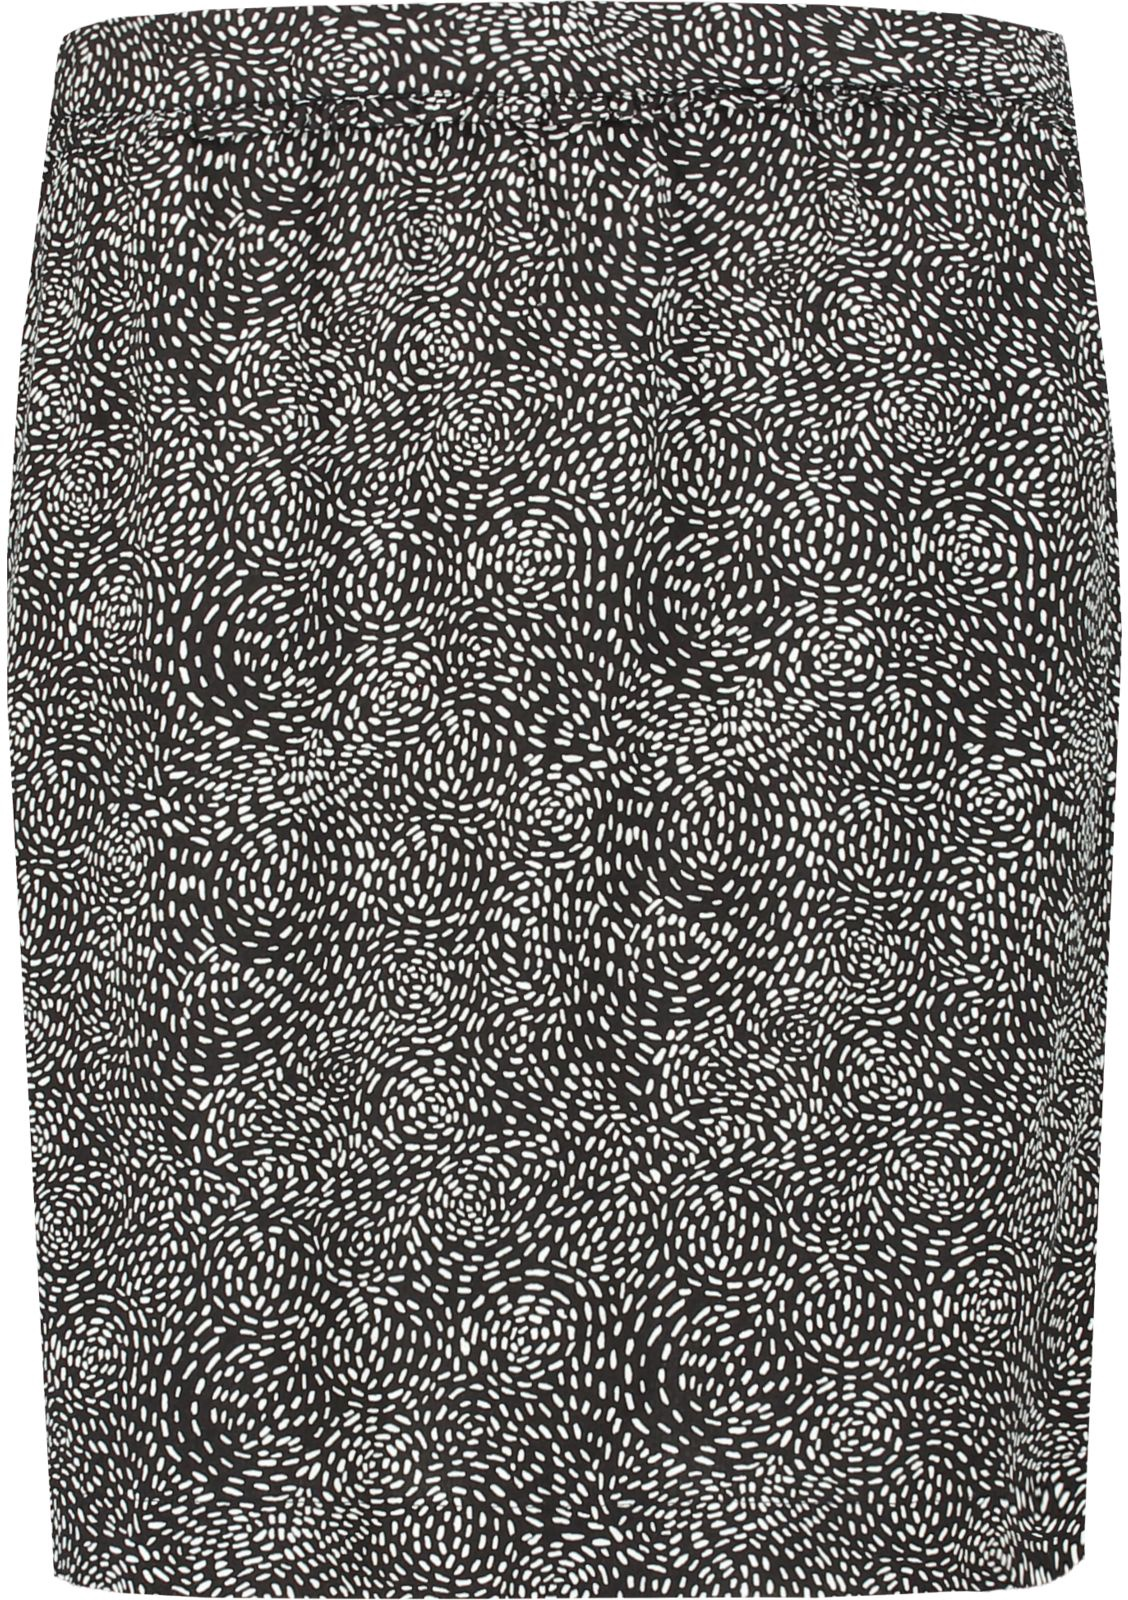 Garcia Print Skirt 90320